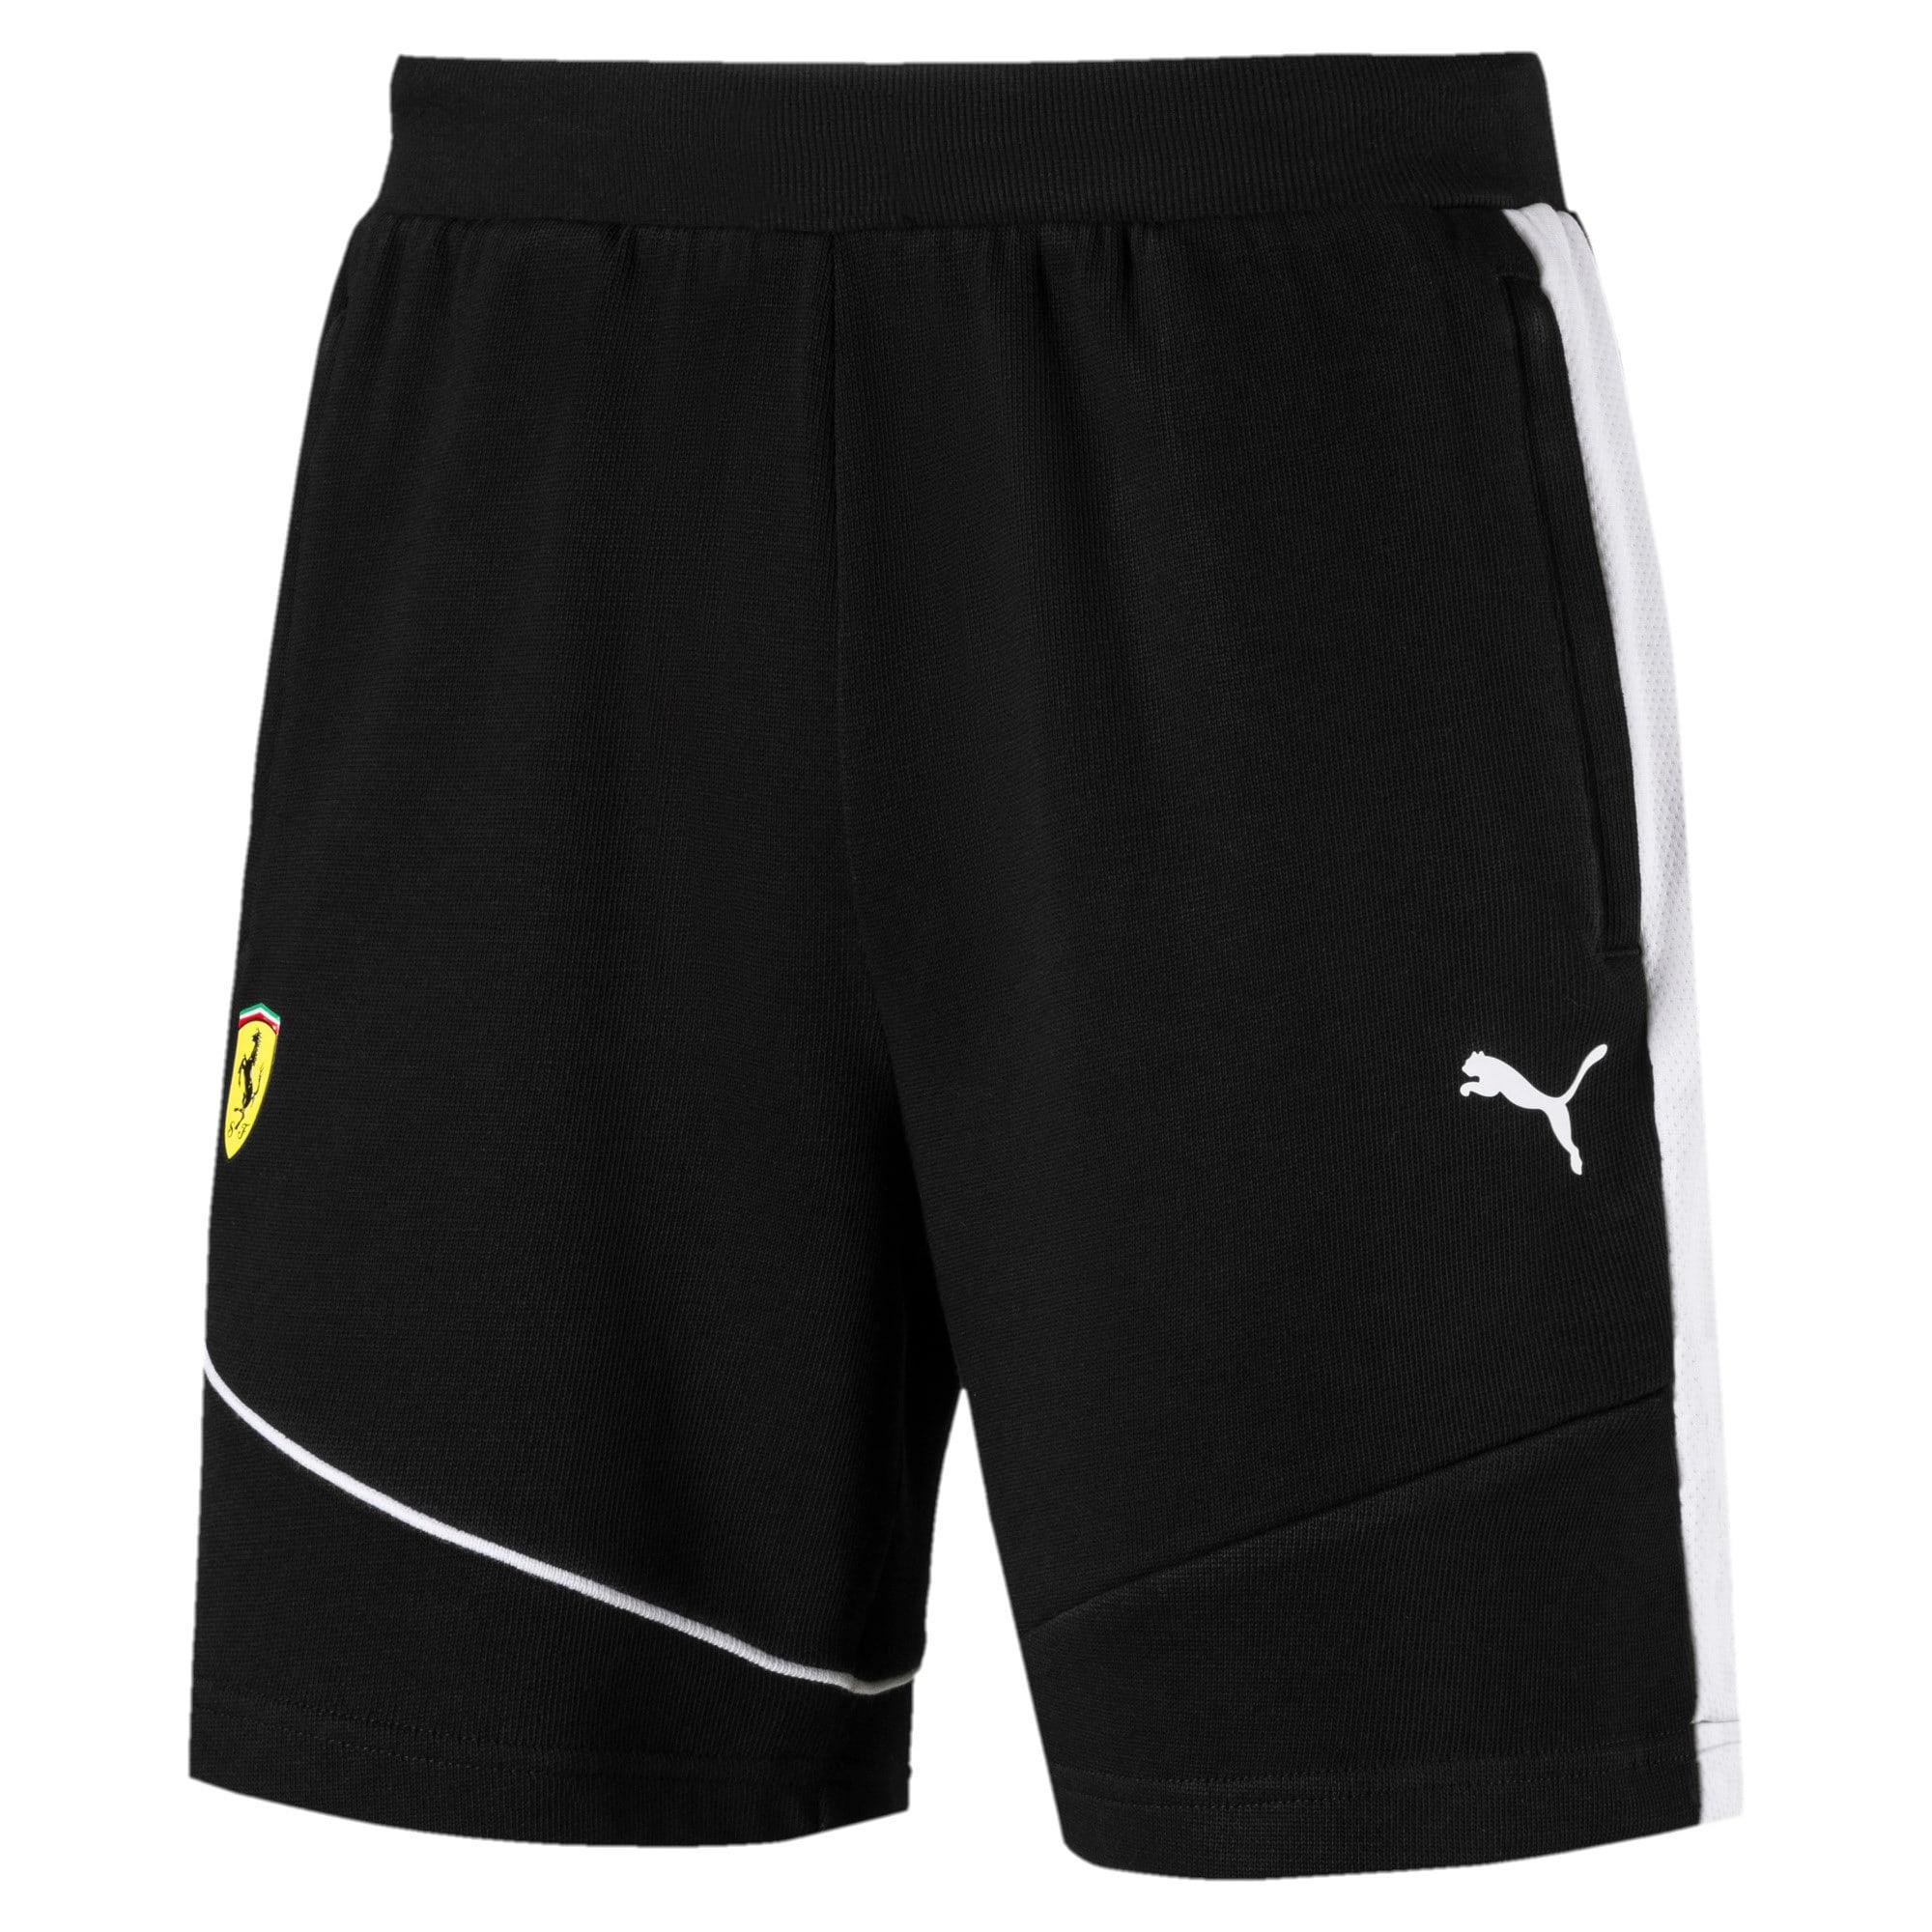 Thumbnail 2 of Ferrari Men's Sweat Shorts, Puma Black, medium-IND